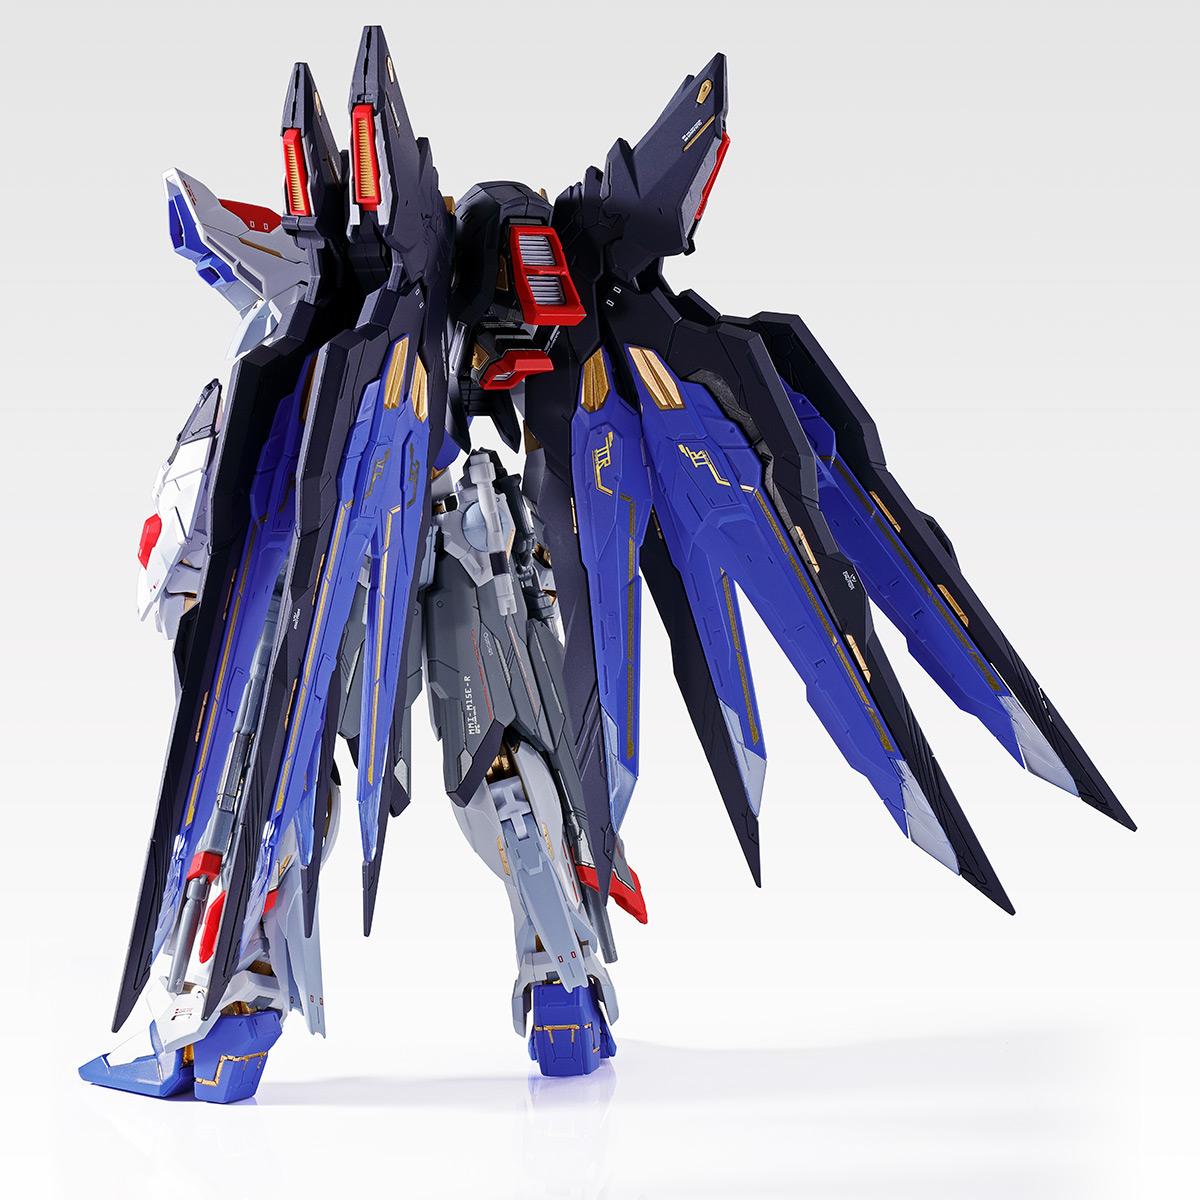 METAL BUILD STRIKE FREEDOM GUNDAM SOUL BLUE Ver 【Second